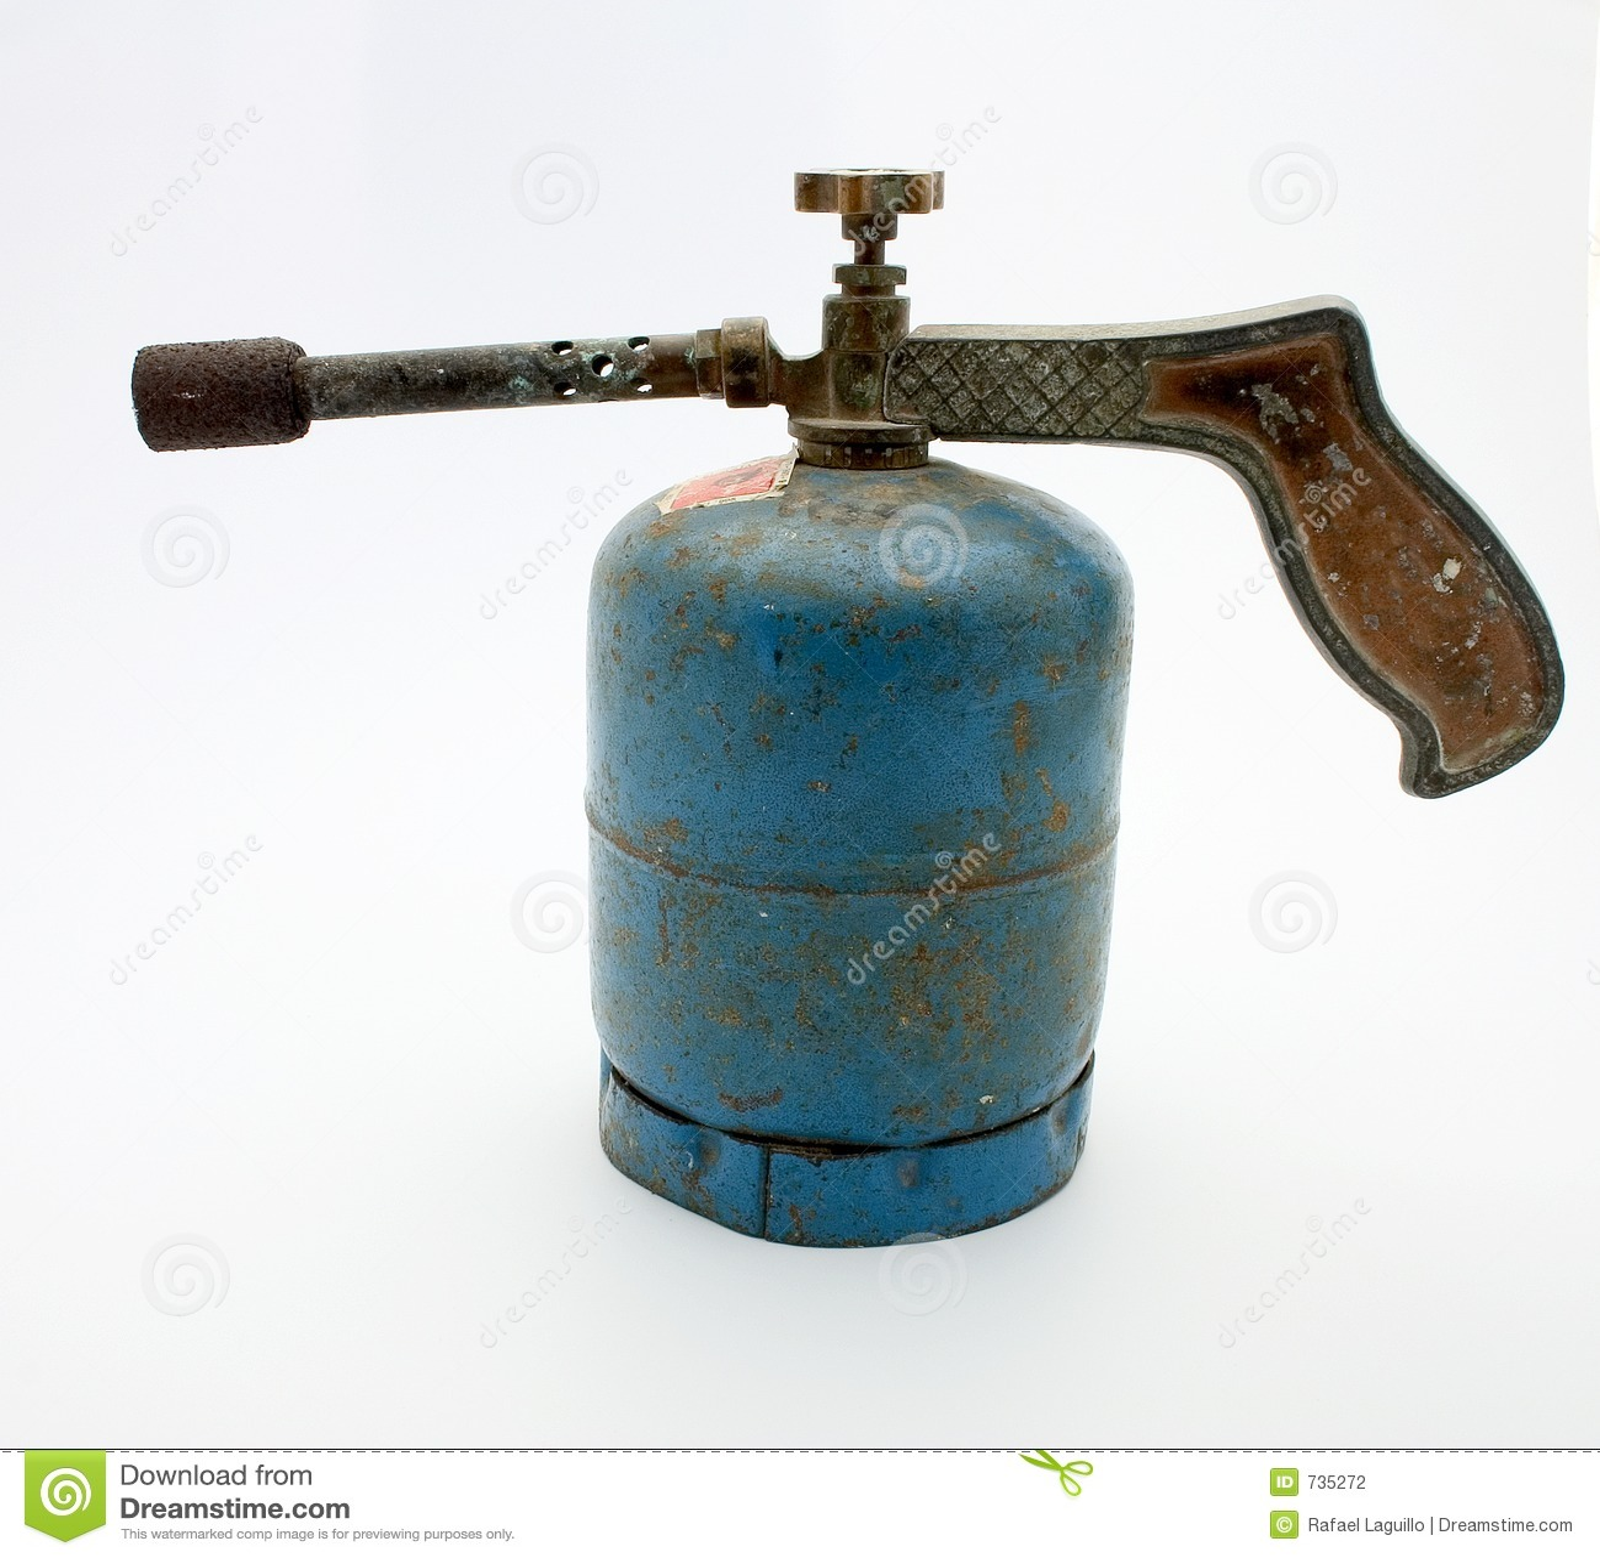 Torche de tuyauterie